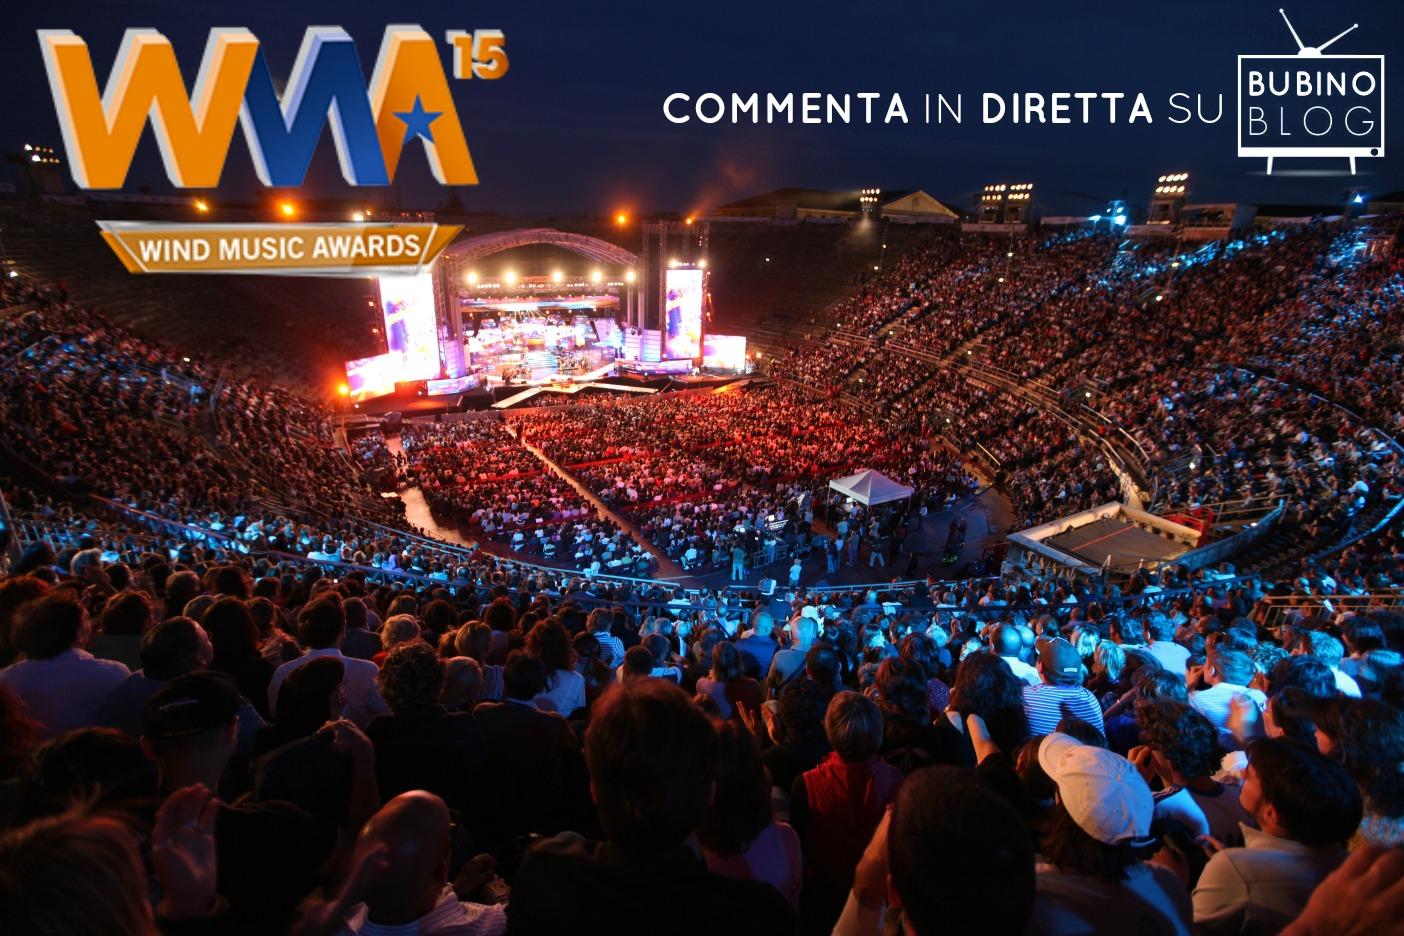 WIND MUSIC AWARDS 2015| COMMENTA IN DIRETTA! WMA2009_untitled-4_foto-Scozzese-2009 (1)